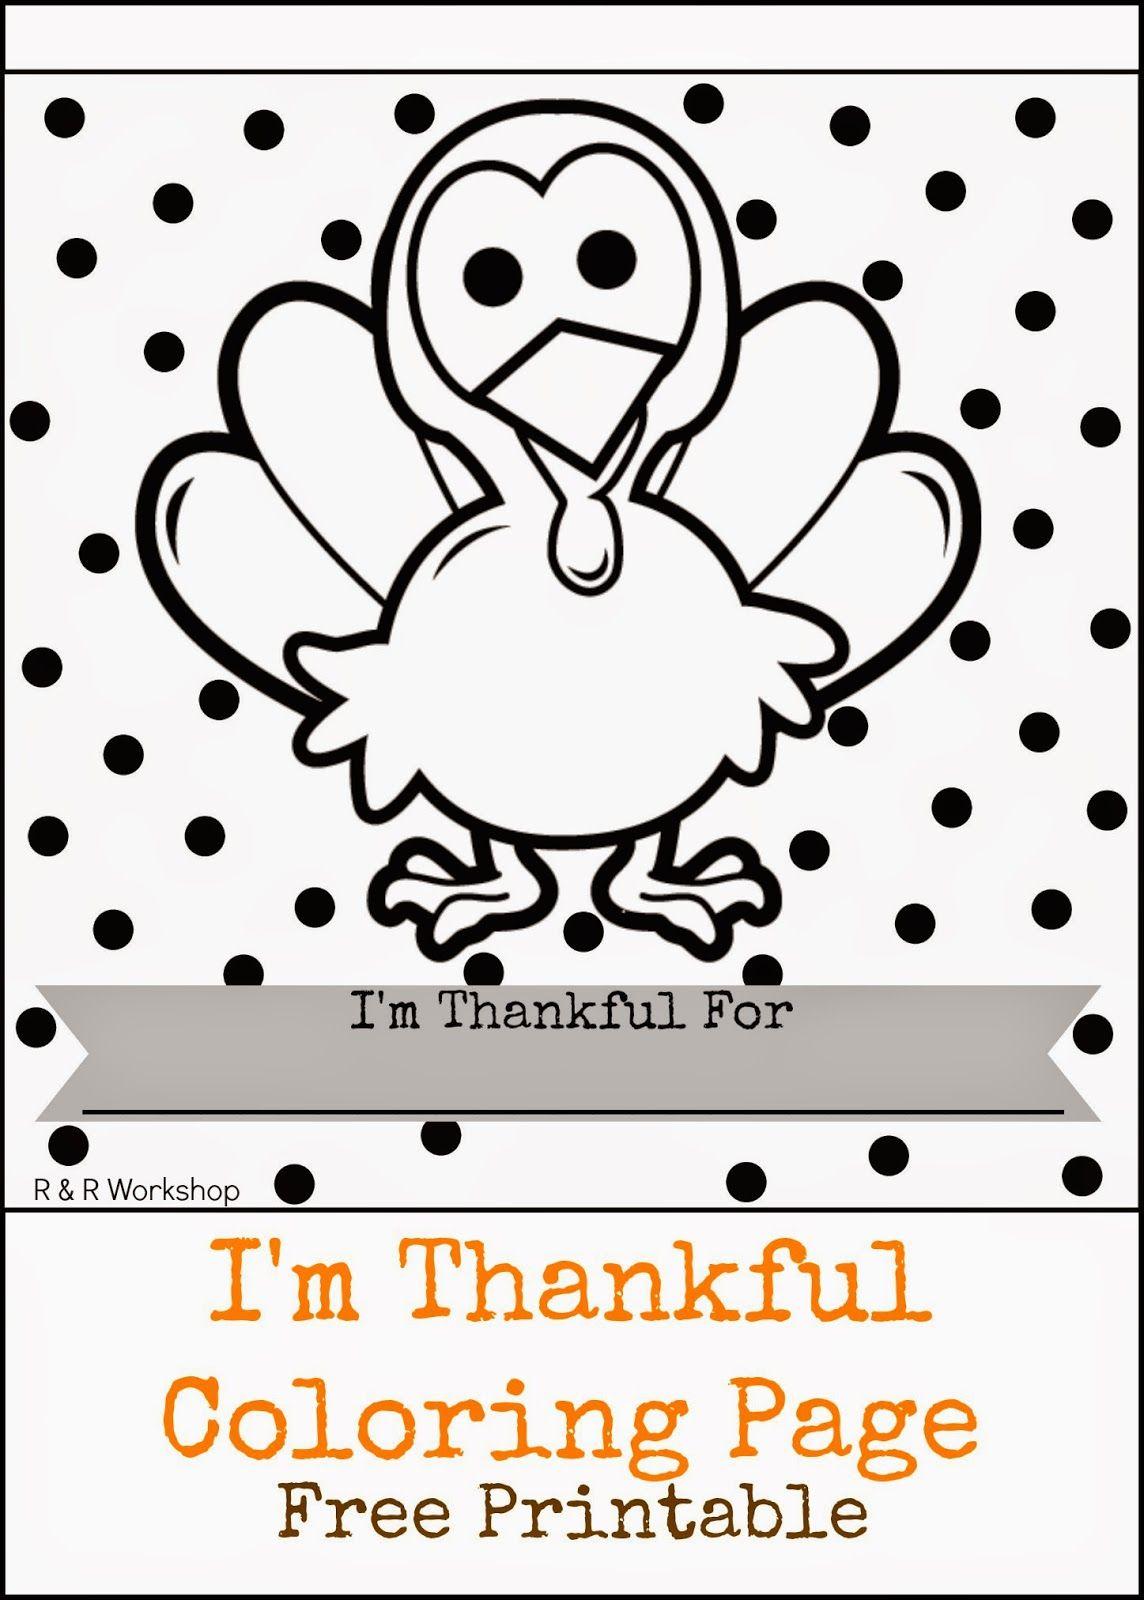 R u r workshop kids thanksgiving coloring page free printable